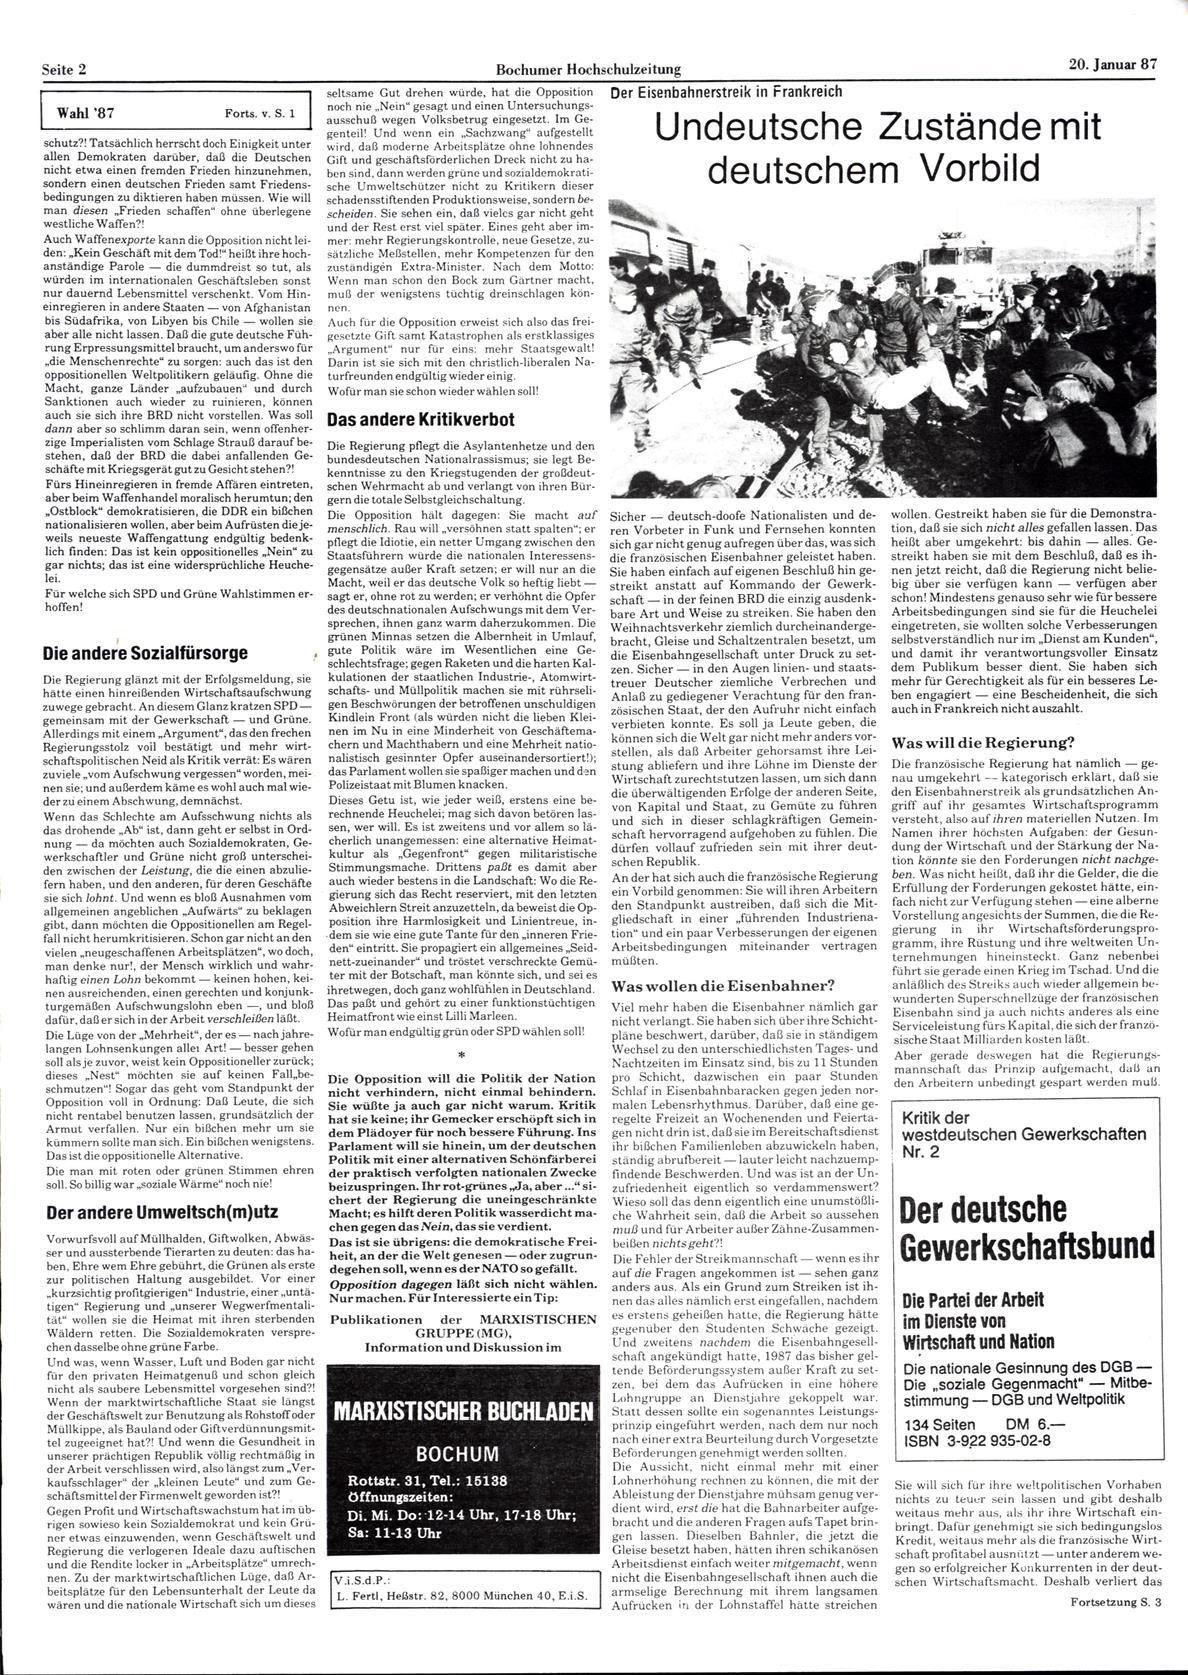 Bochum_BHZ_19870120_144_002